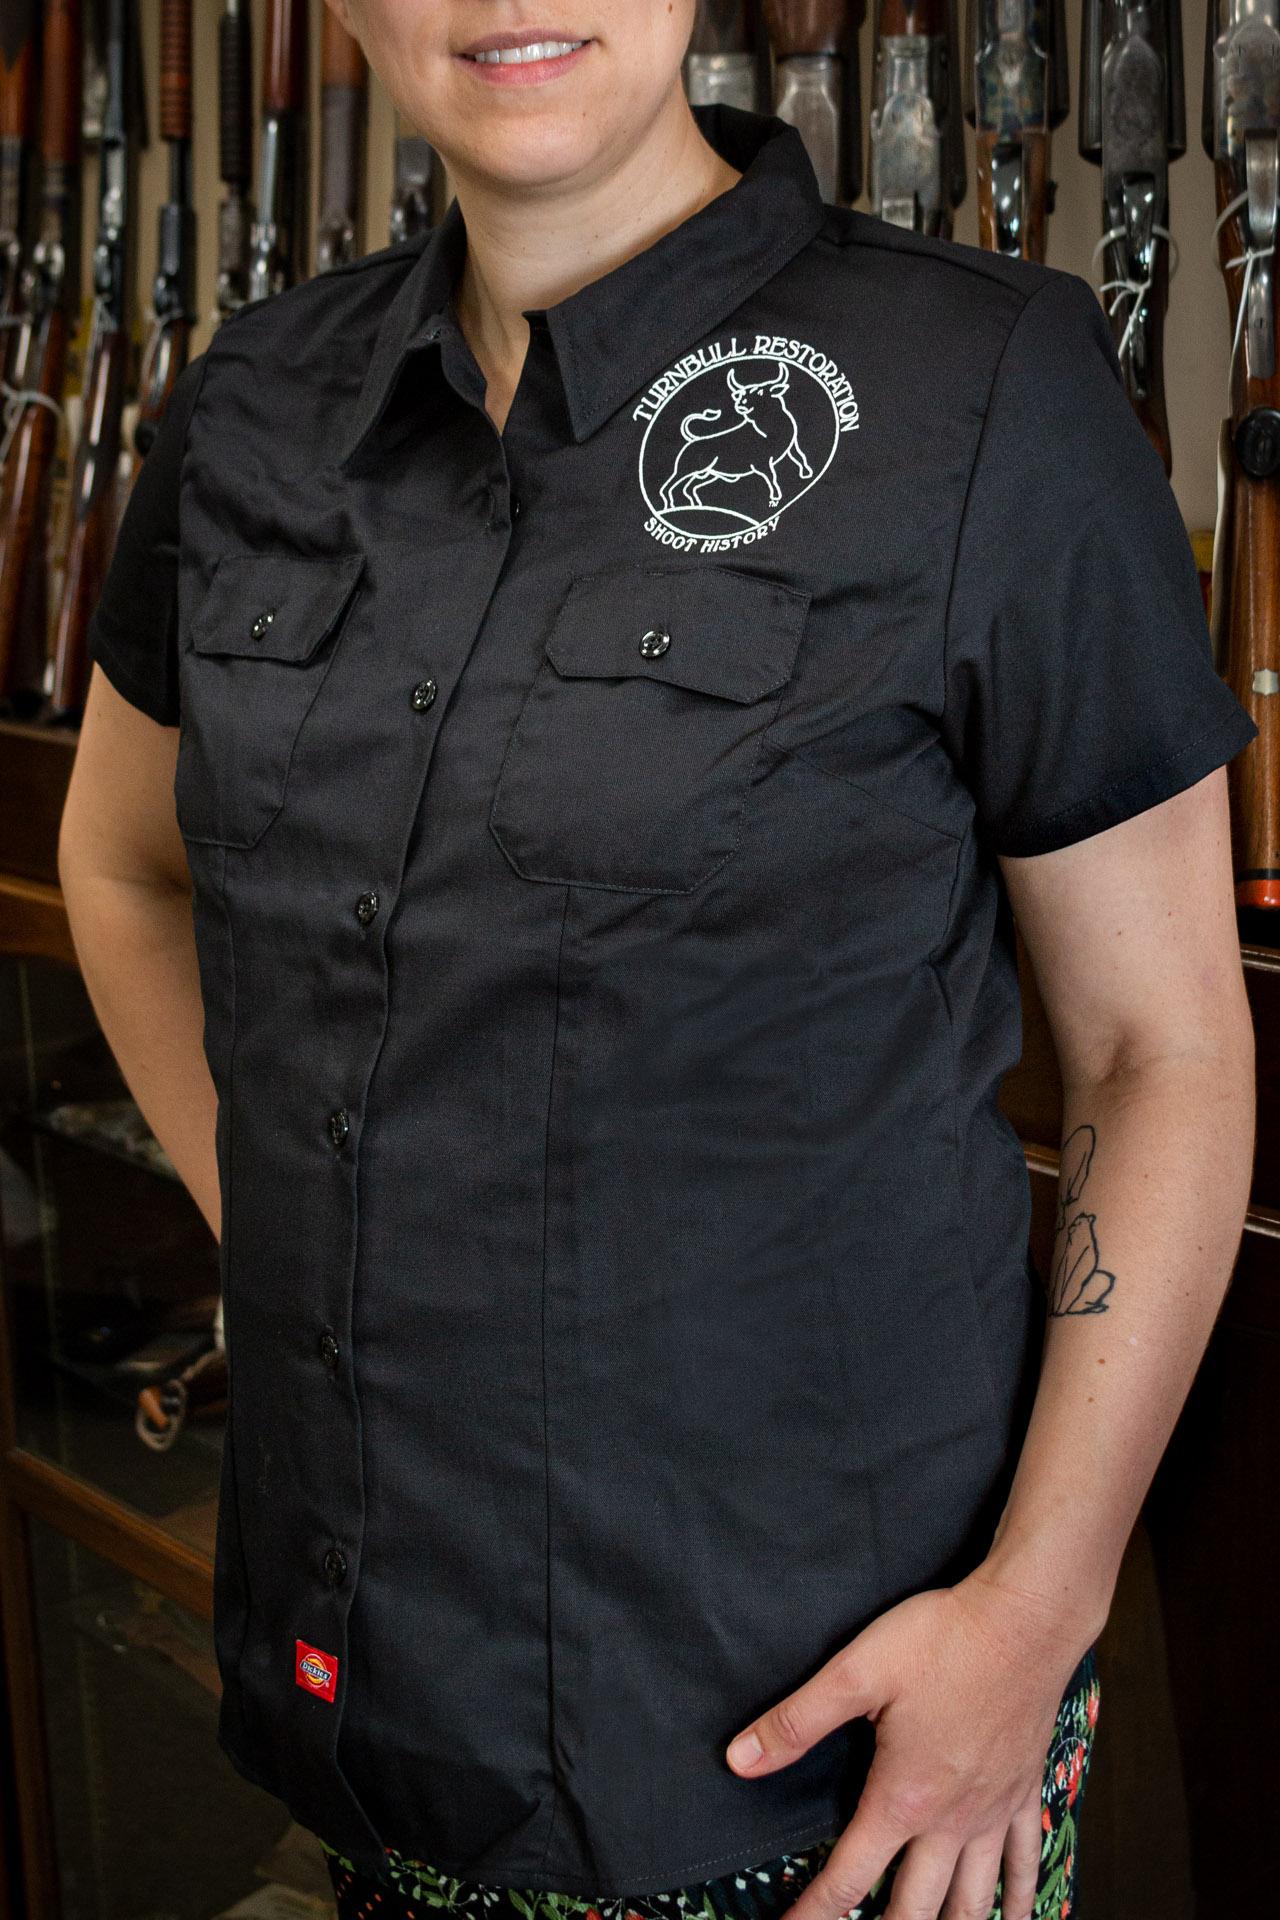 Photo of a Turnbull Restoration Dickies work shirt